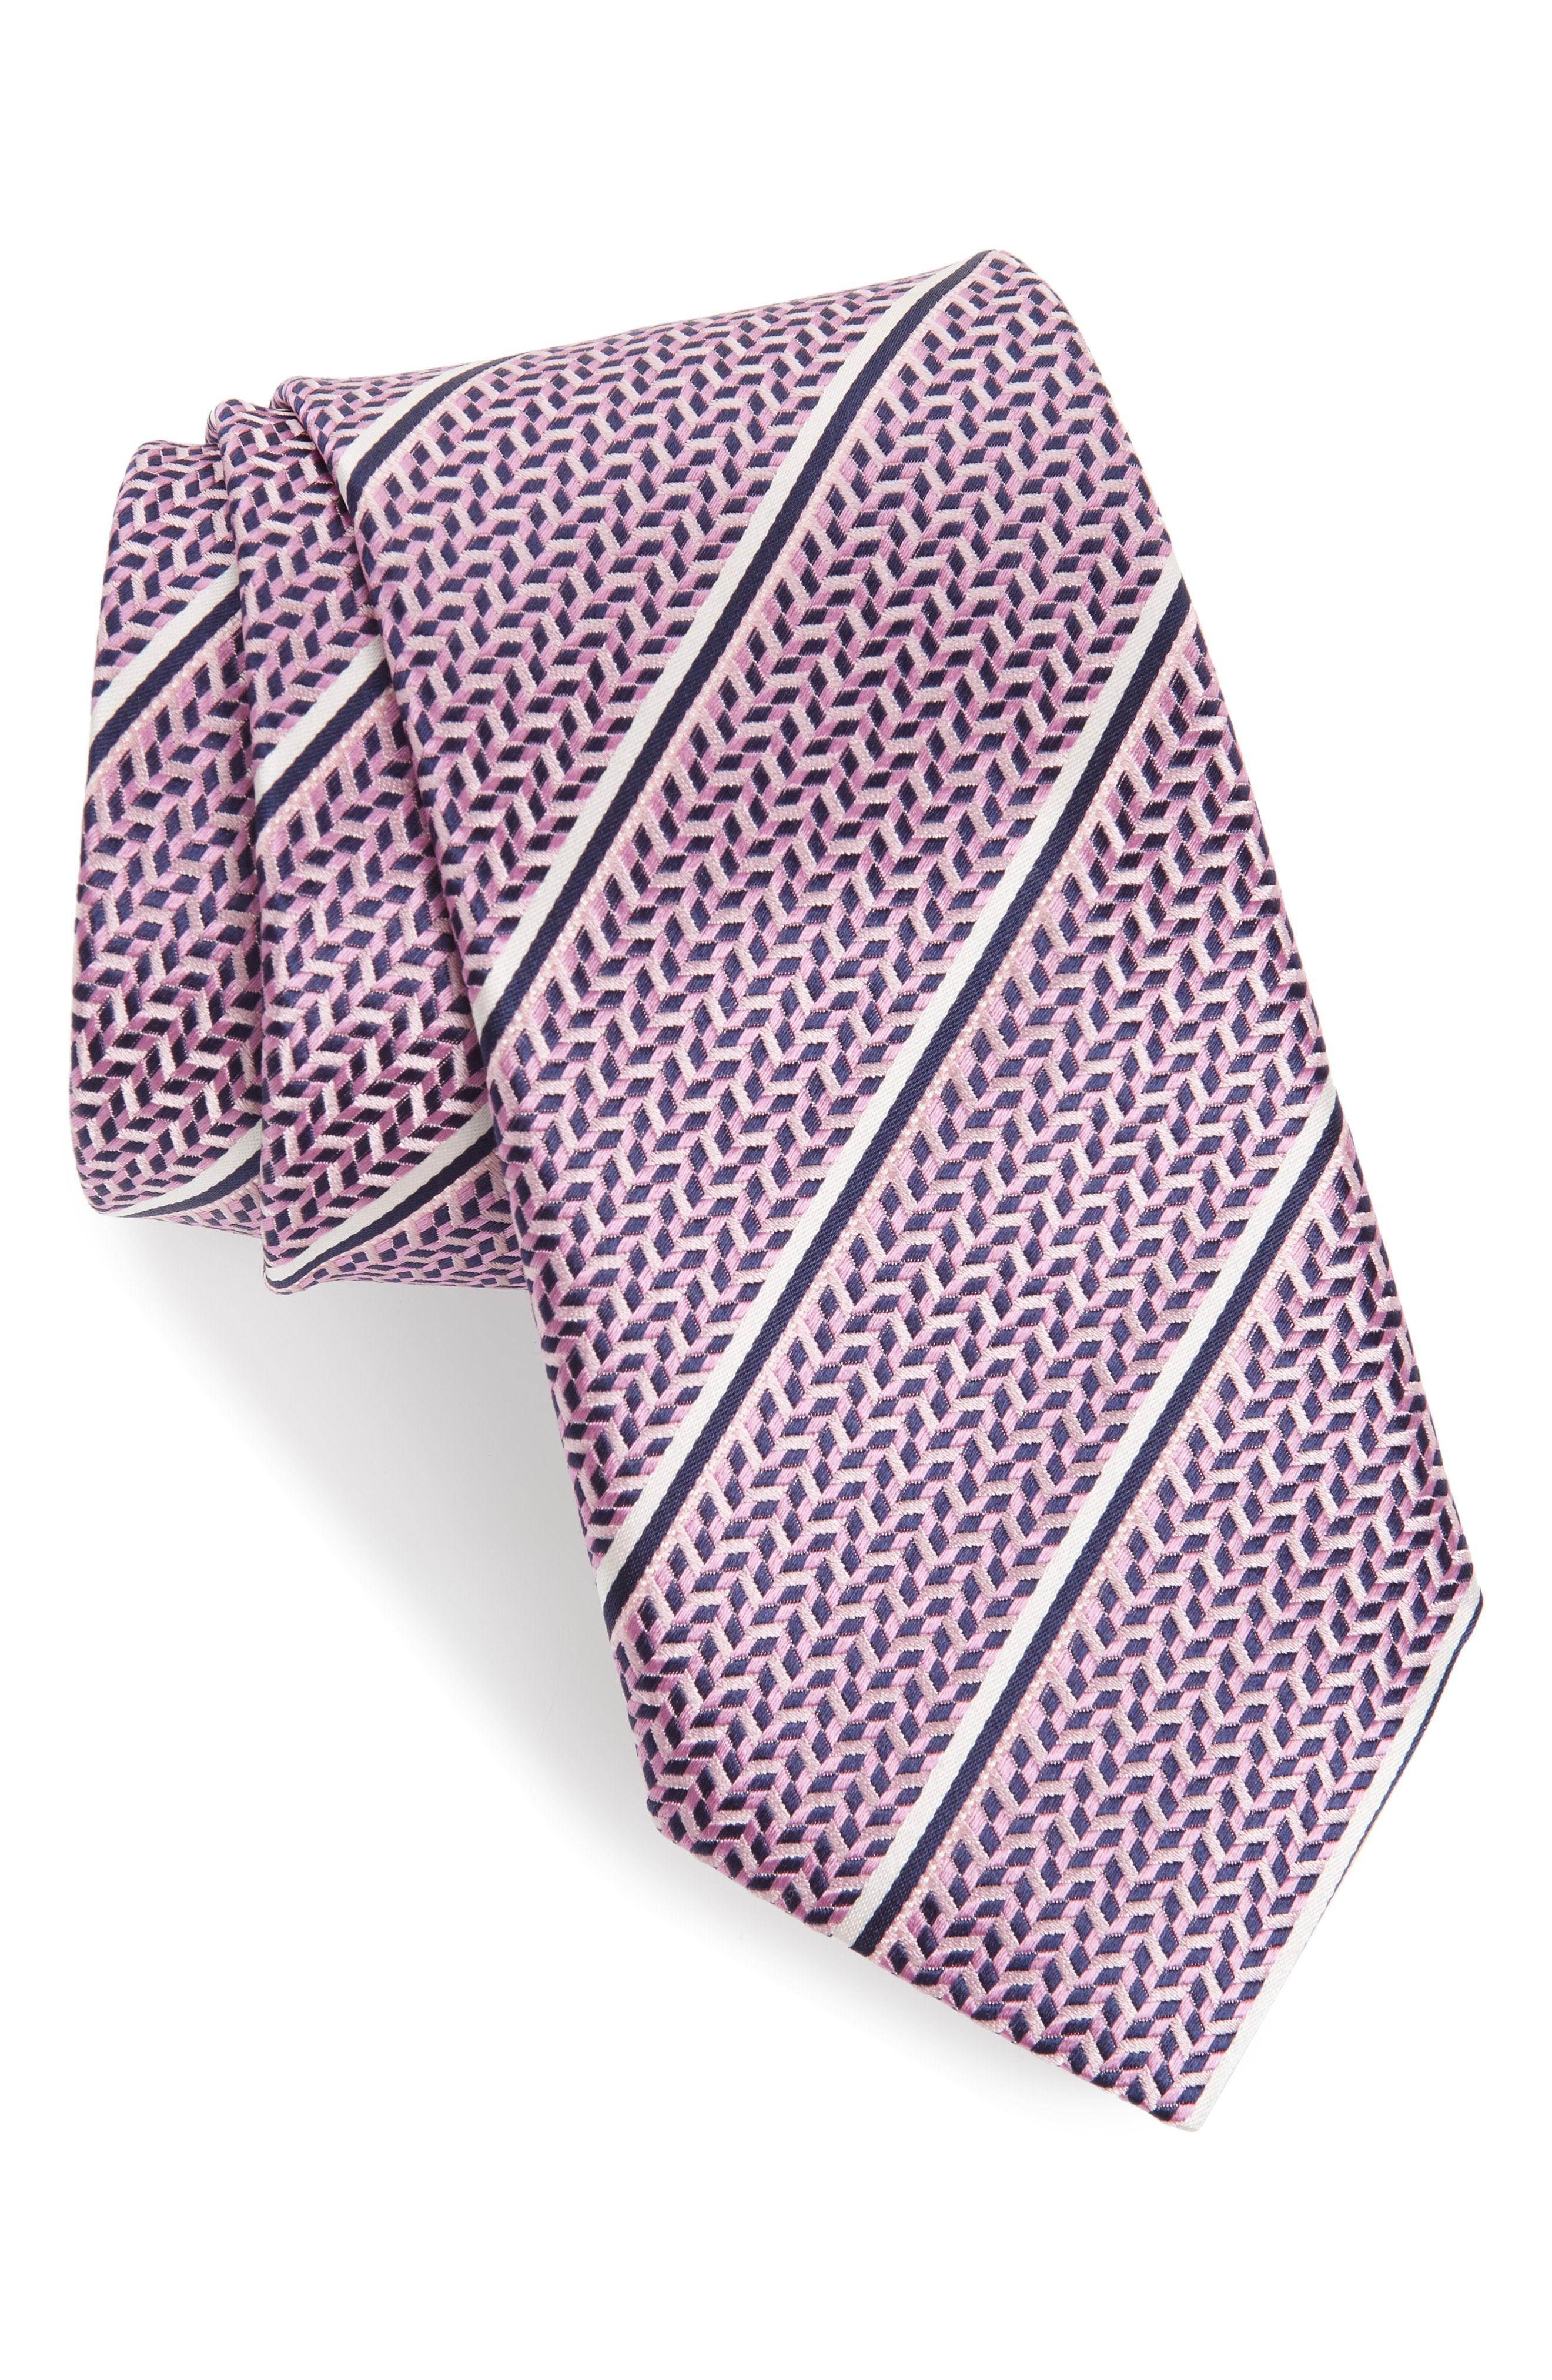 Canali men/'s pink striped tie $160